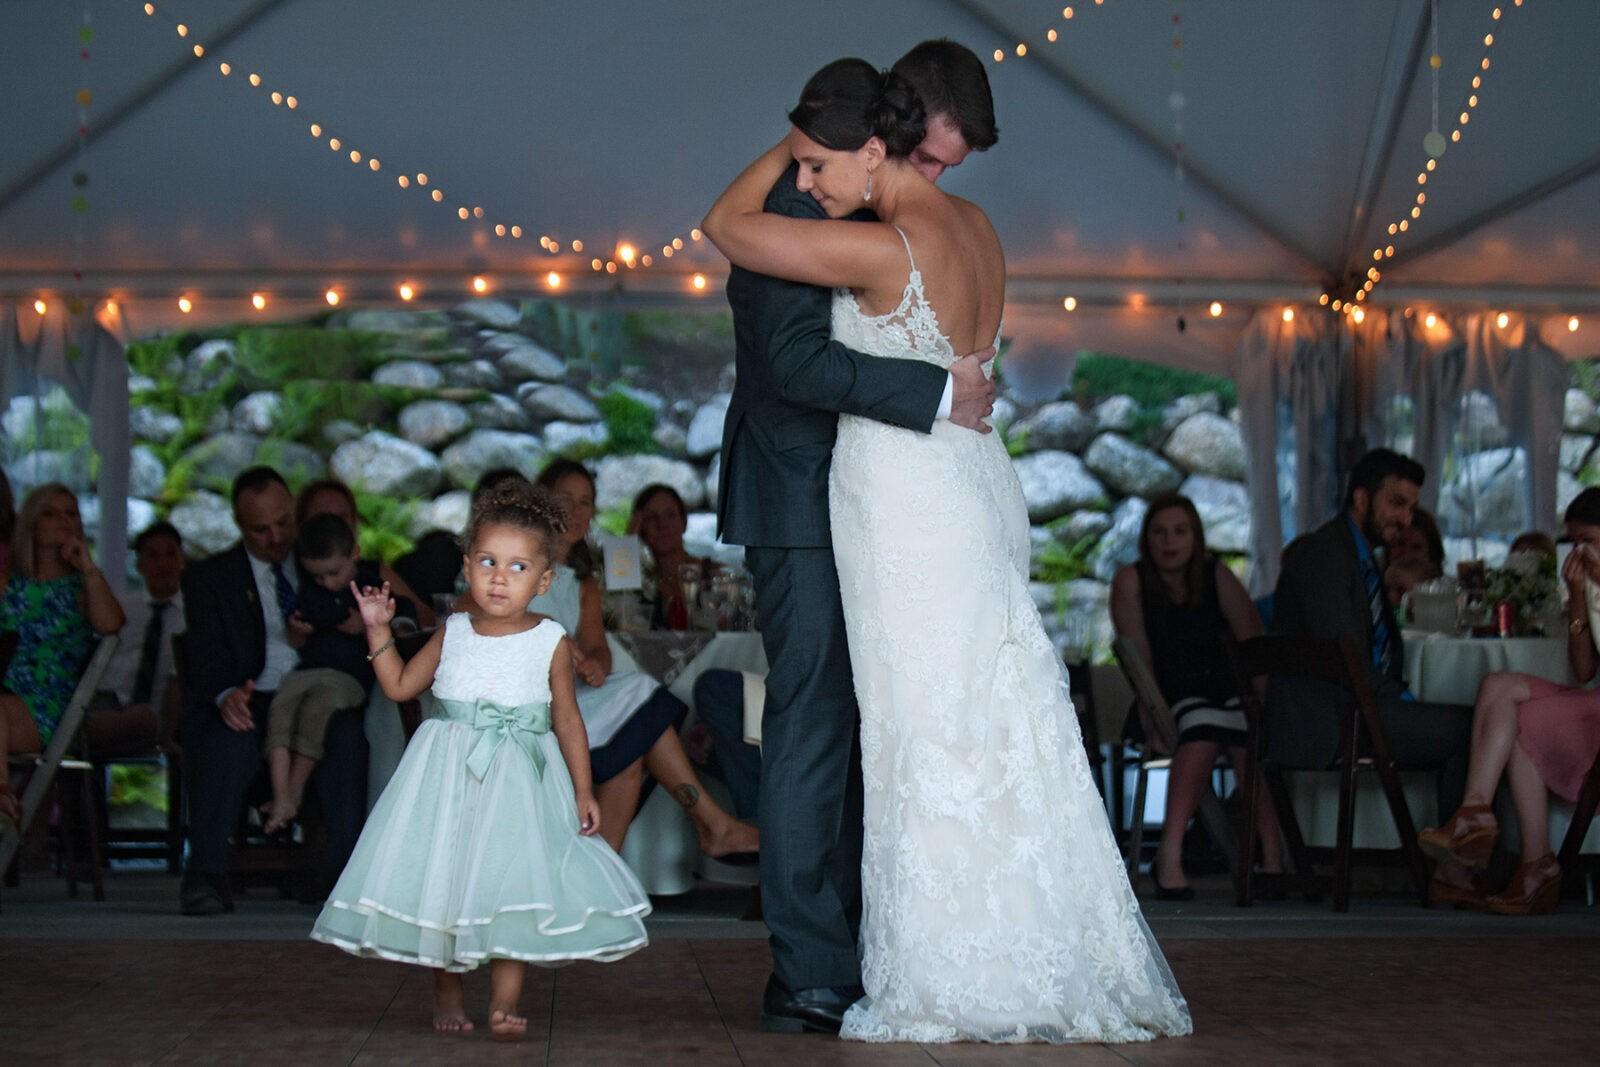 LAKE SHORE VILLAGE RESORT WEDDING IN WEARE, NH